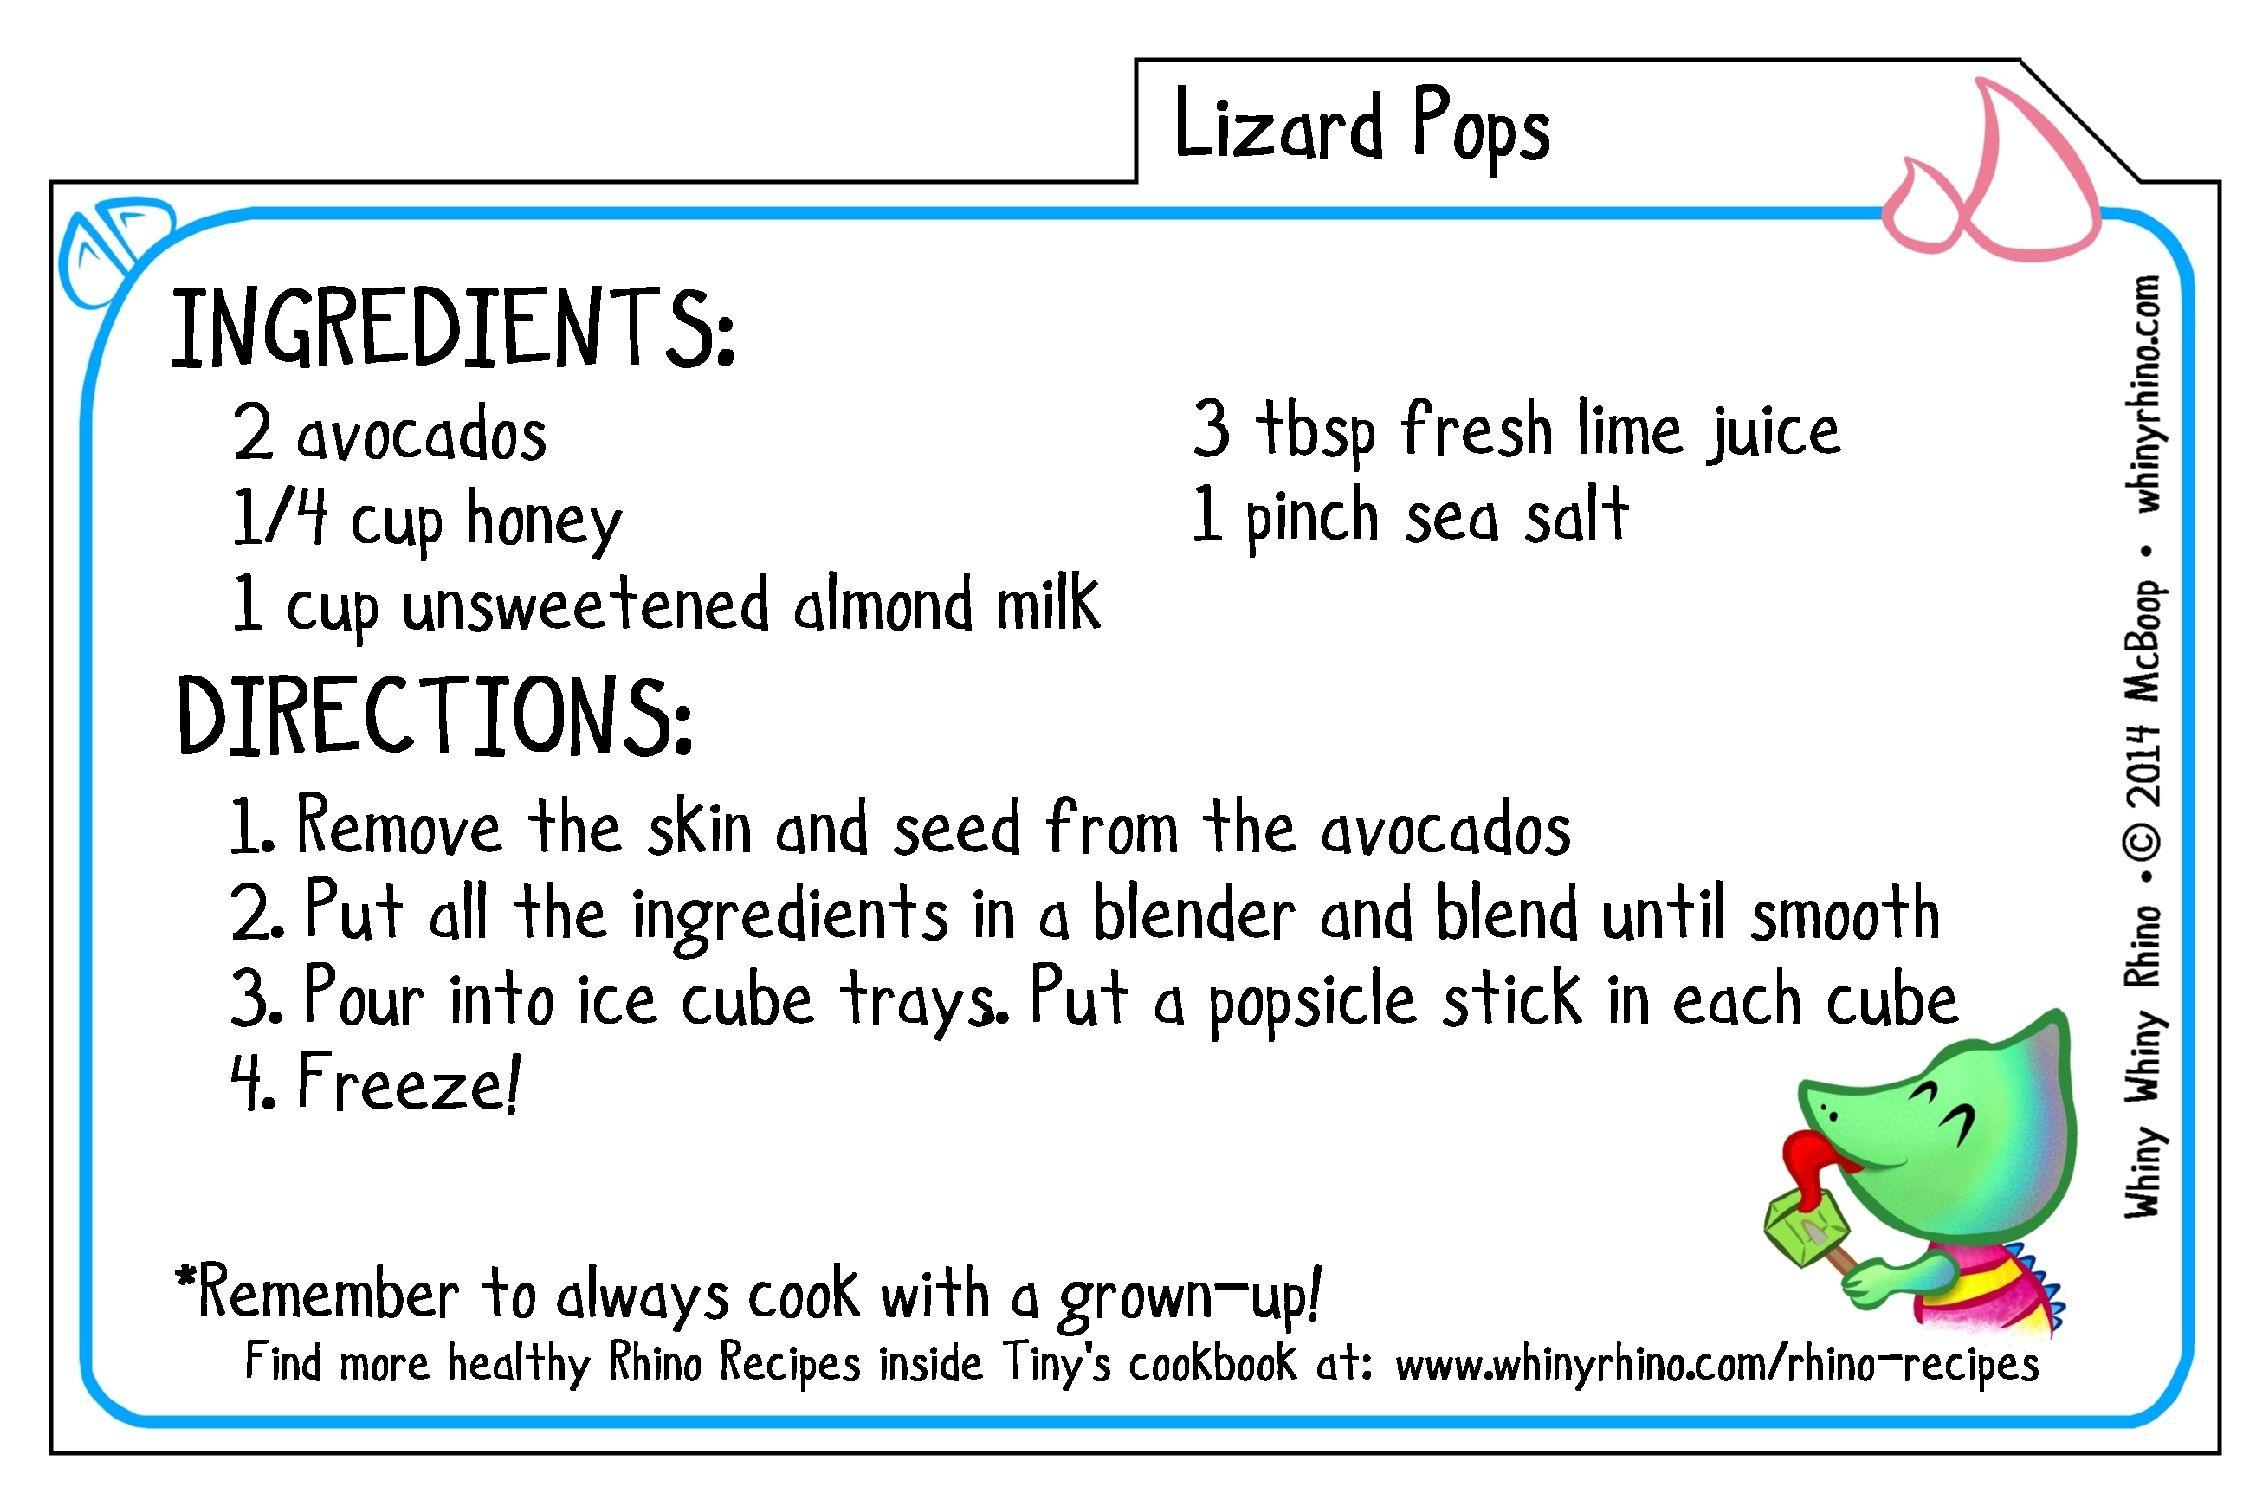 Lizard Pops Recipe Like A Healthy Sweet And Salty